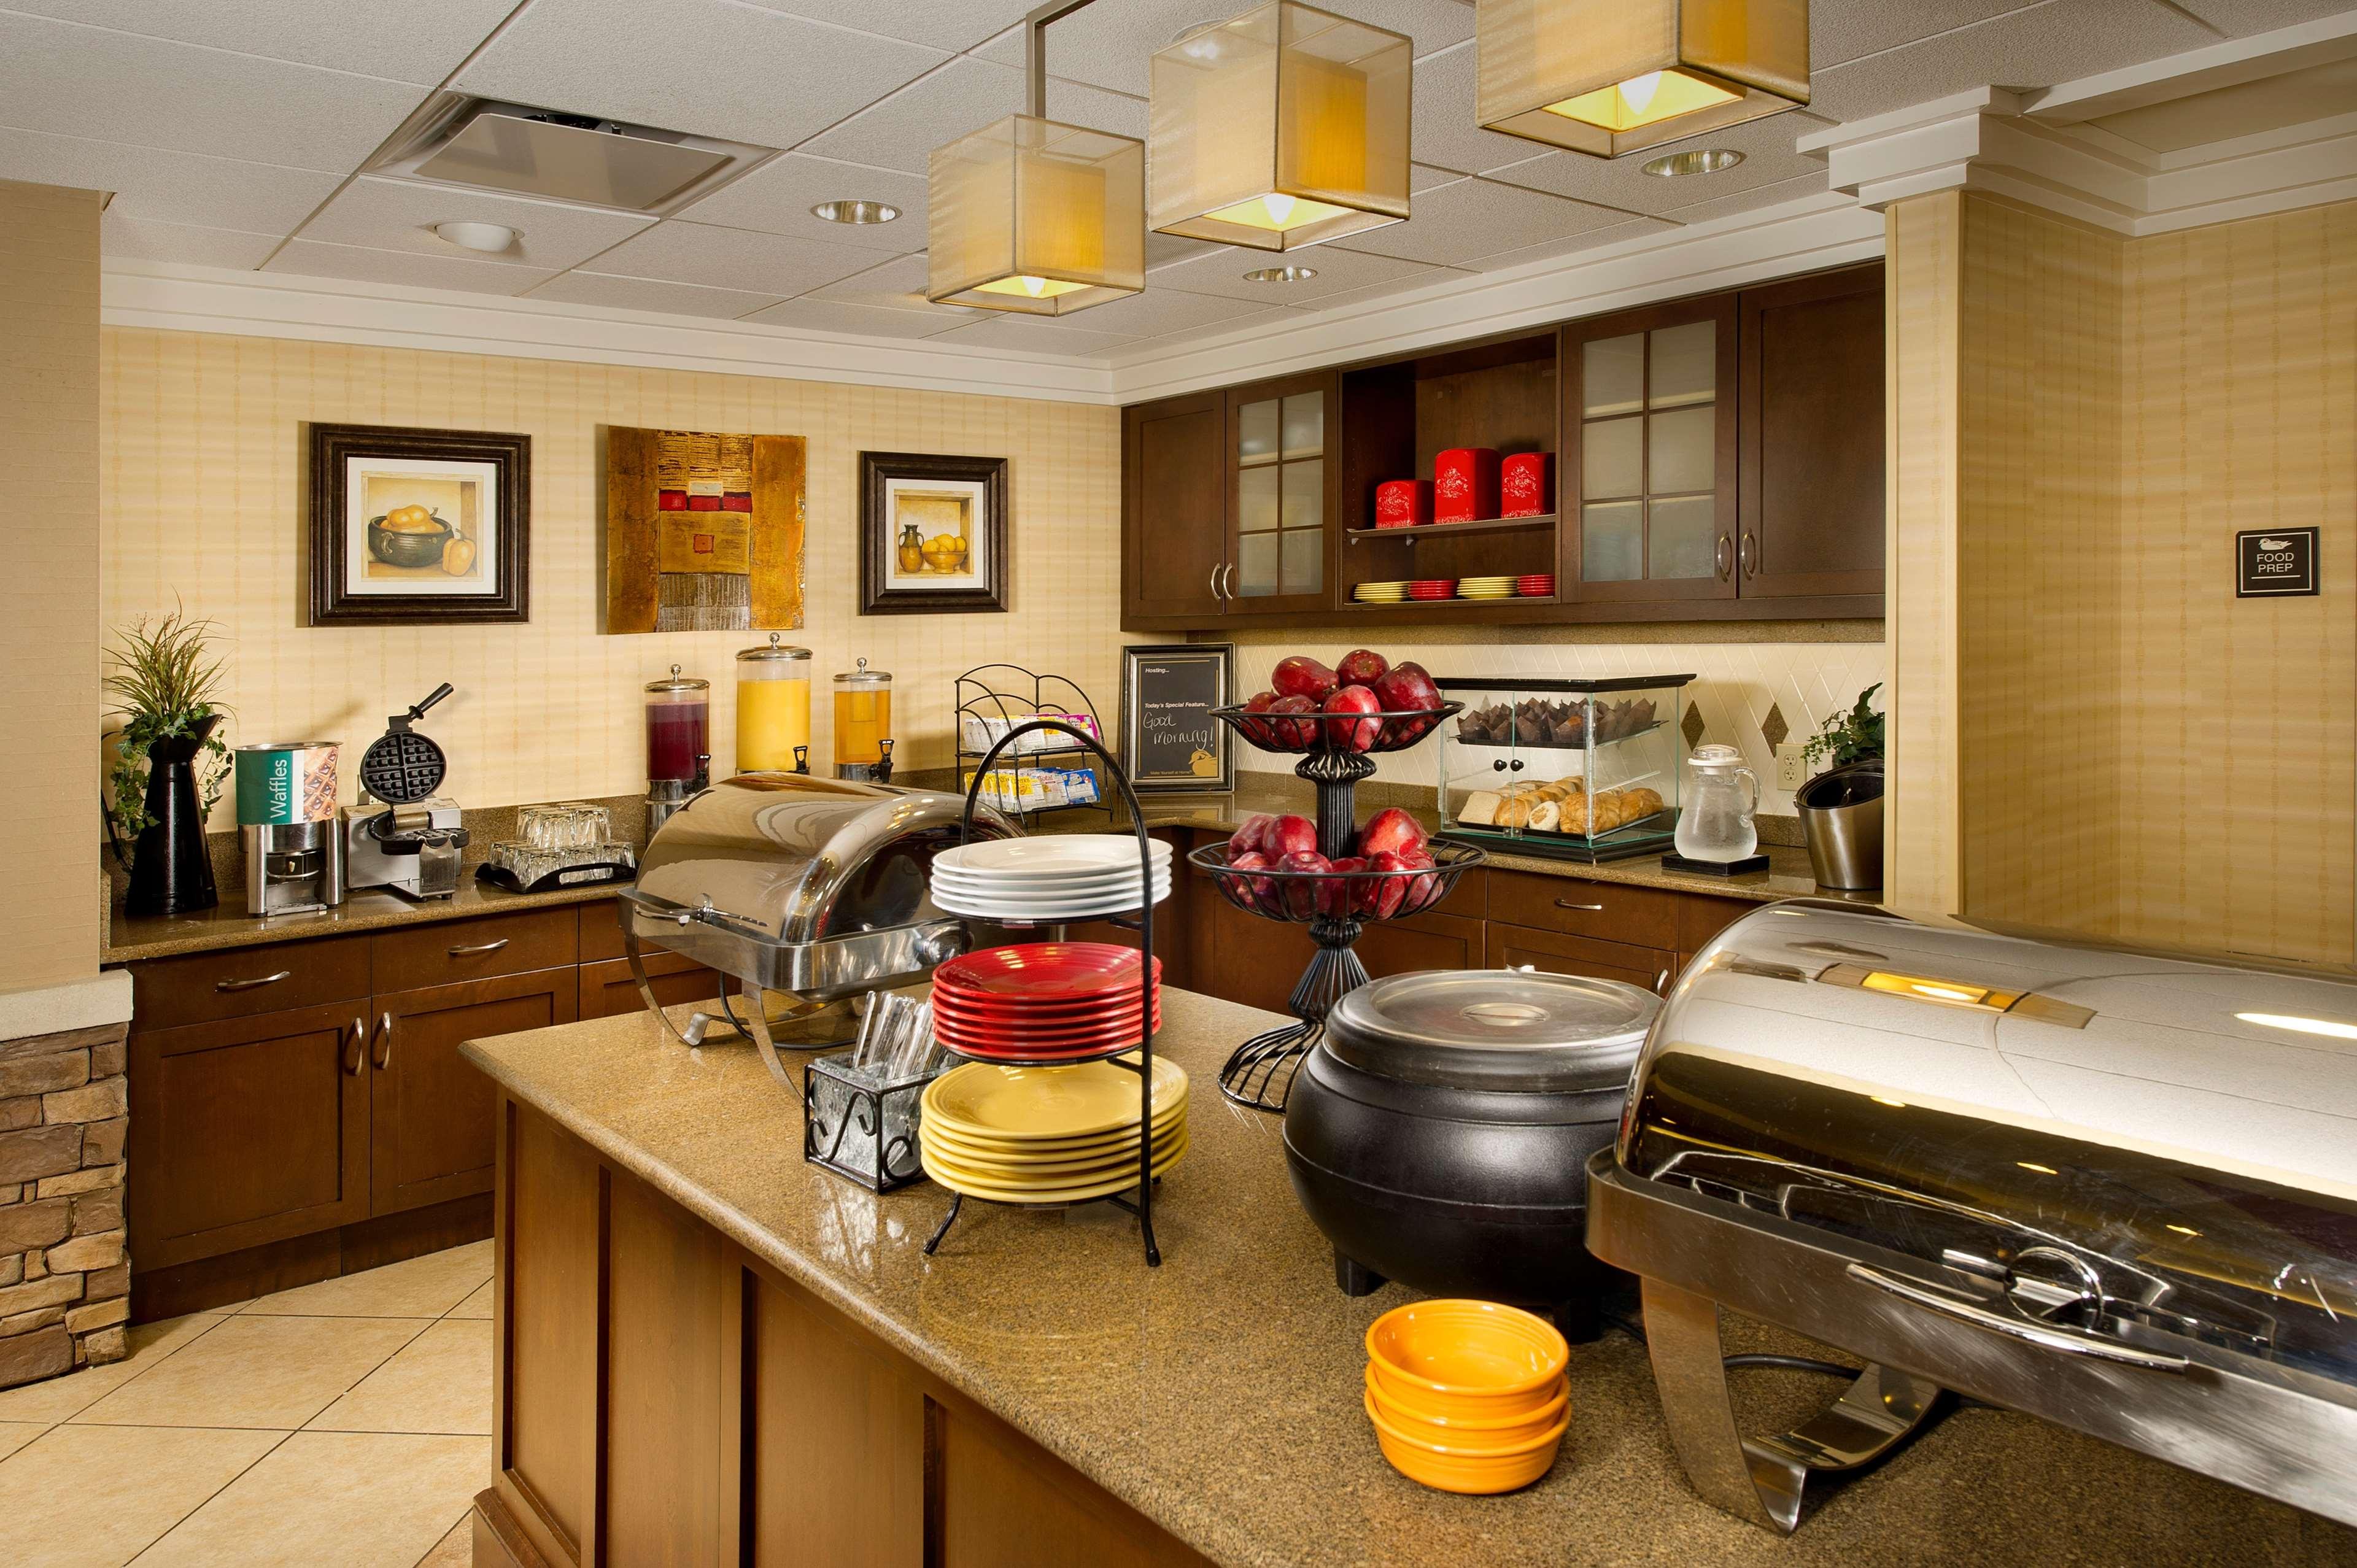 Homewood Suites by Hilton Columbus image 9